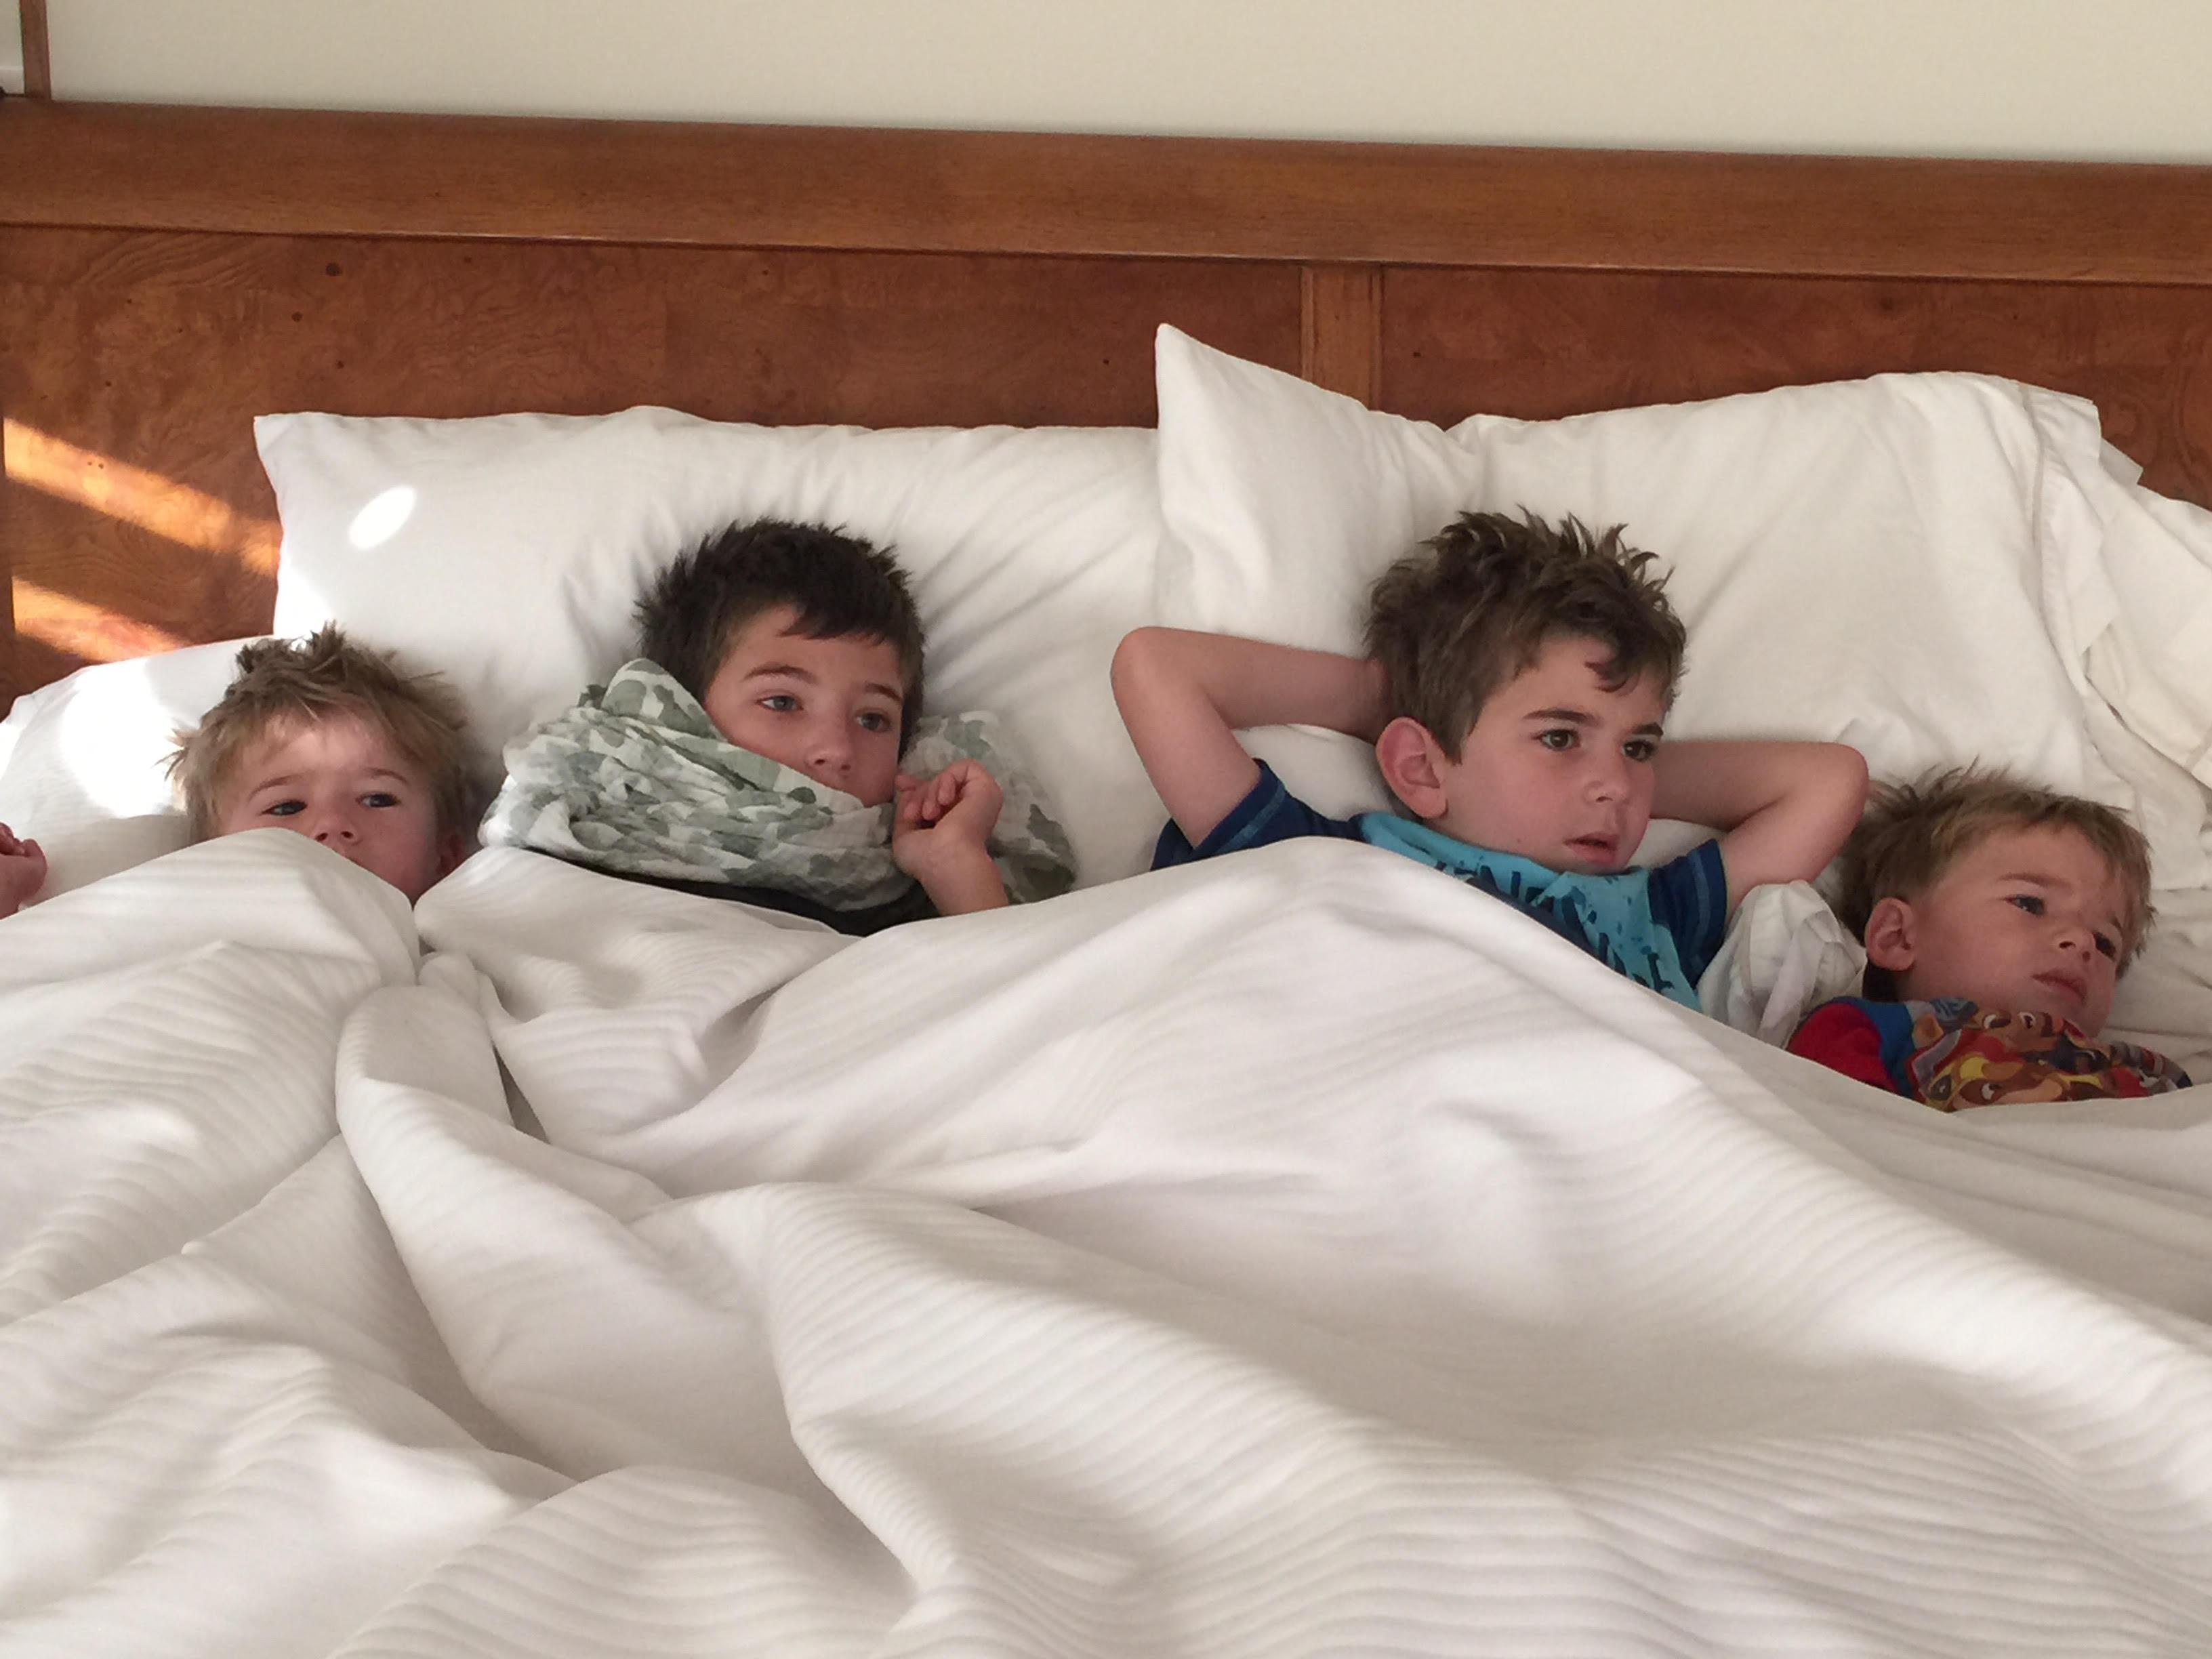 Jack Jonah Noah Gabe first time sleeping over Jun 20 2015